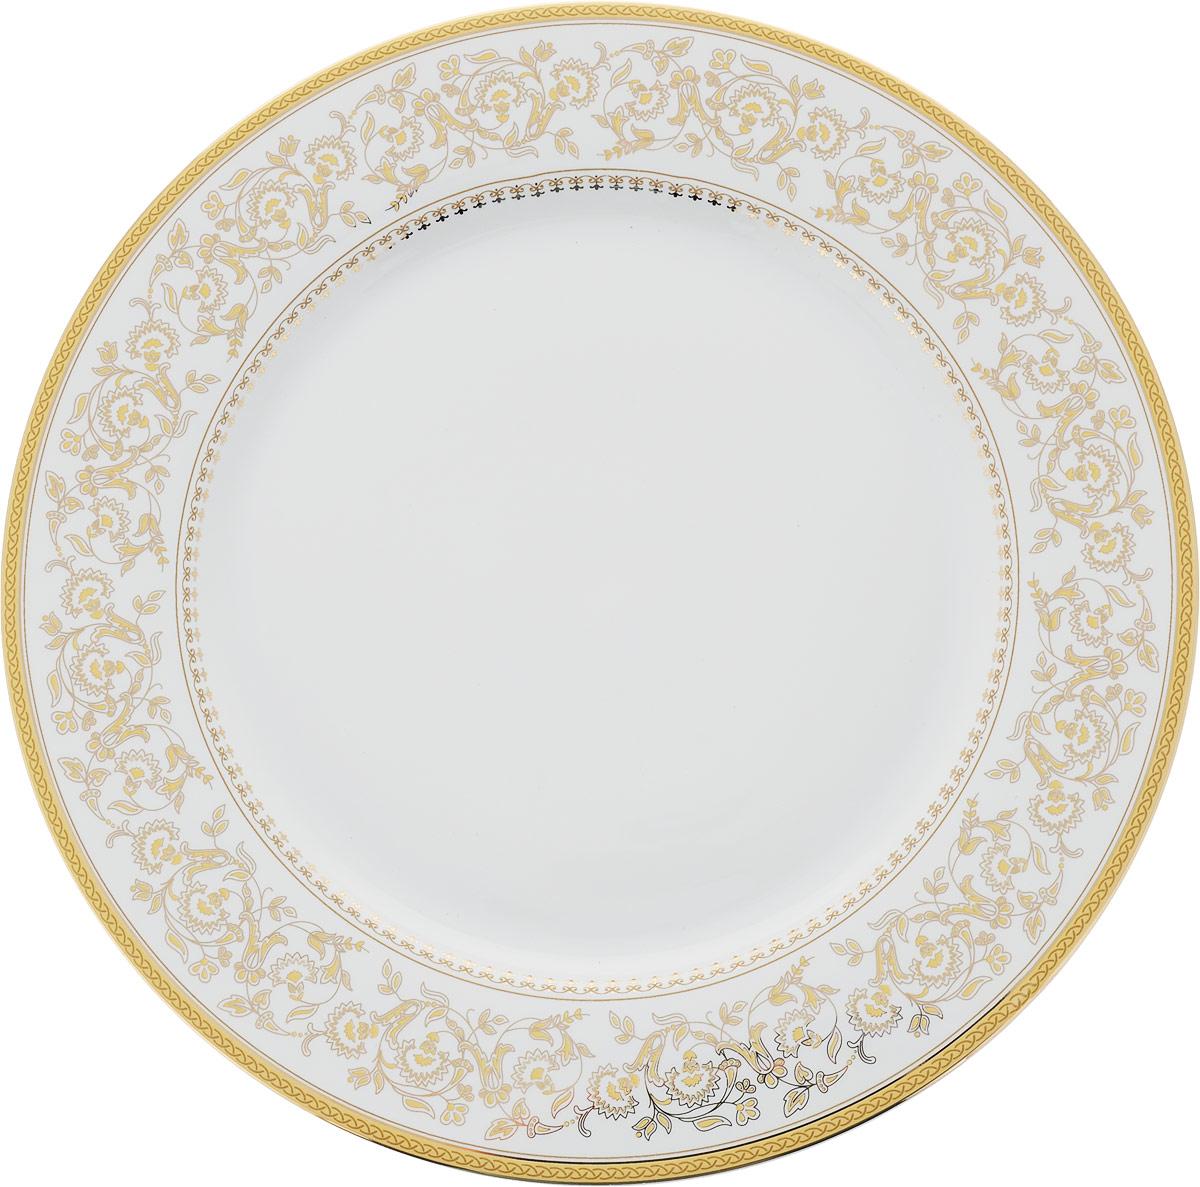 Тарелка обеденная МФК-профит Империя, диаметр 23 см king tony kt 4783 10g page 9